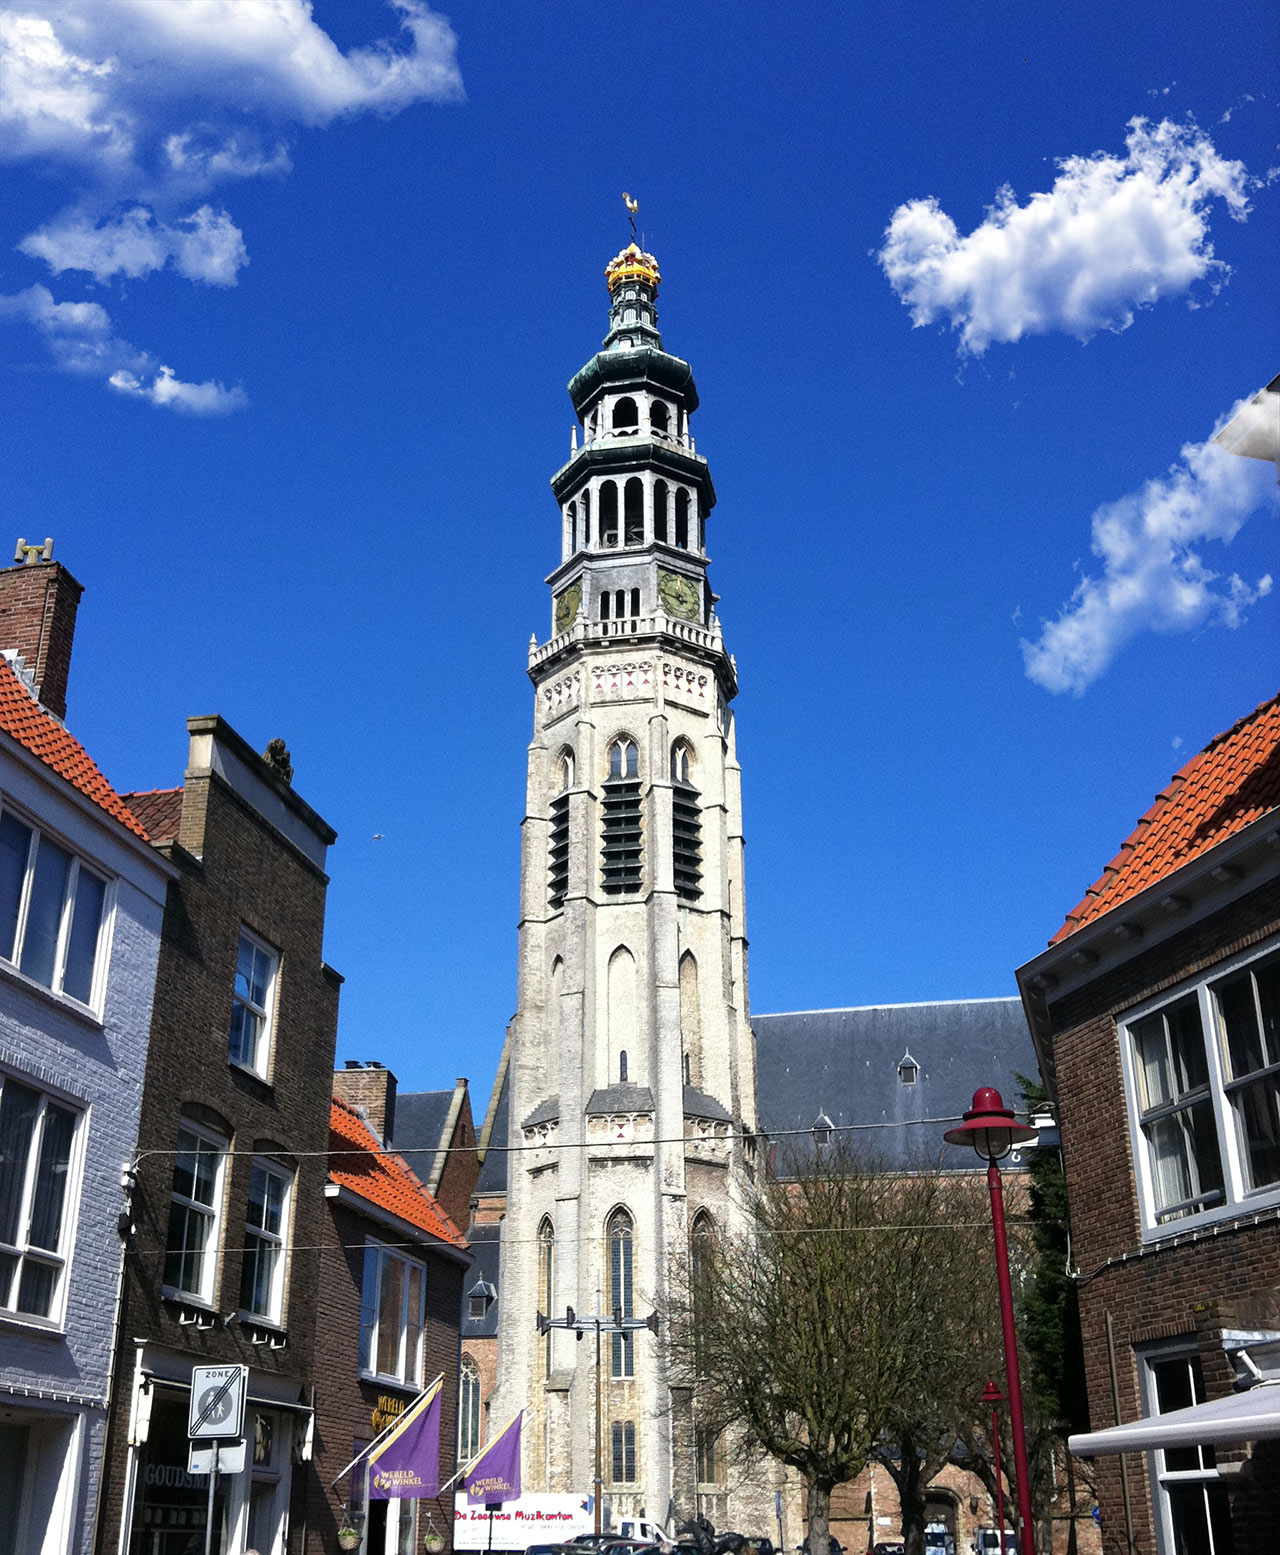 Der Lange Jan in Middelburg